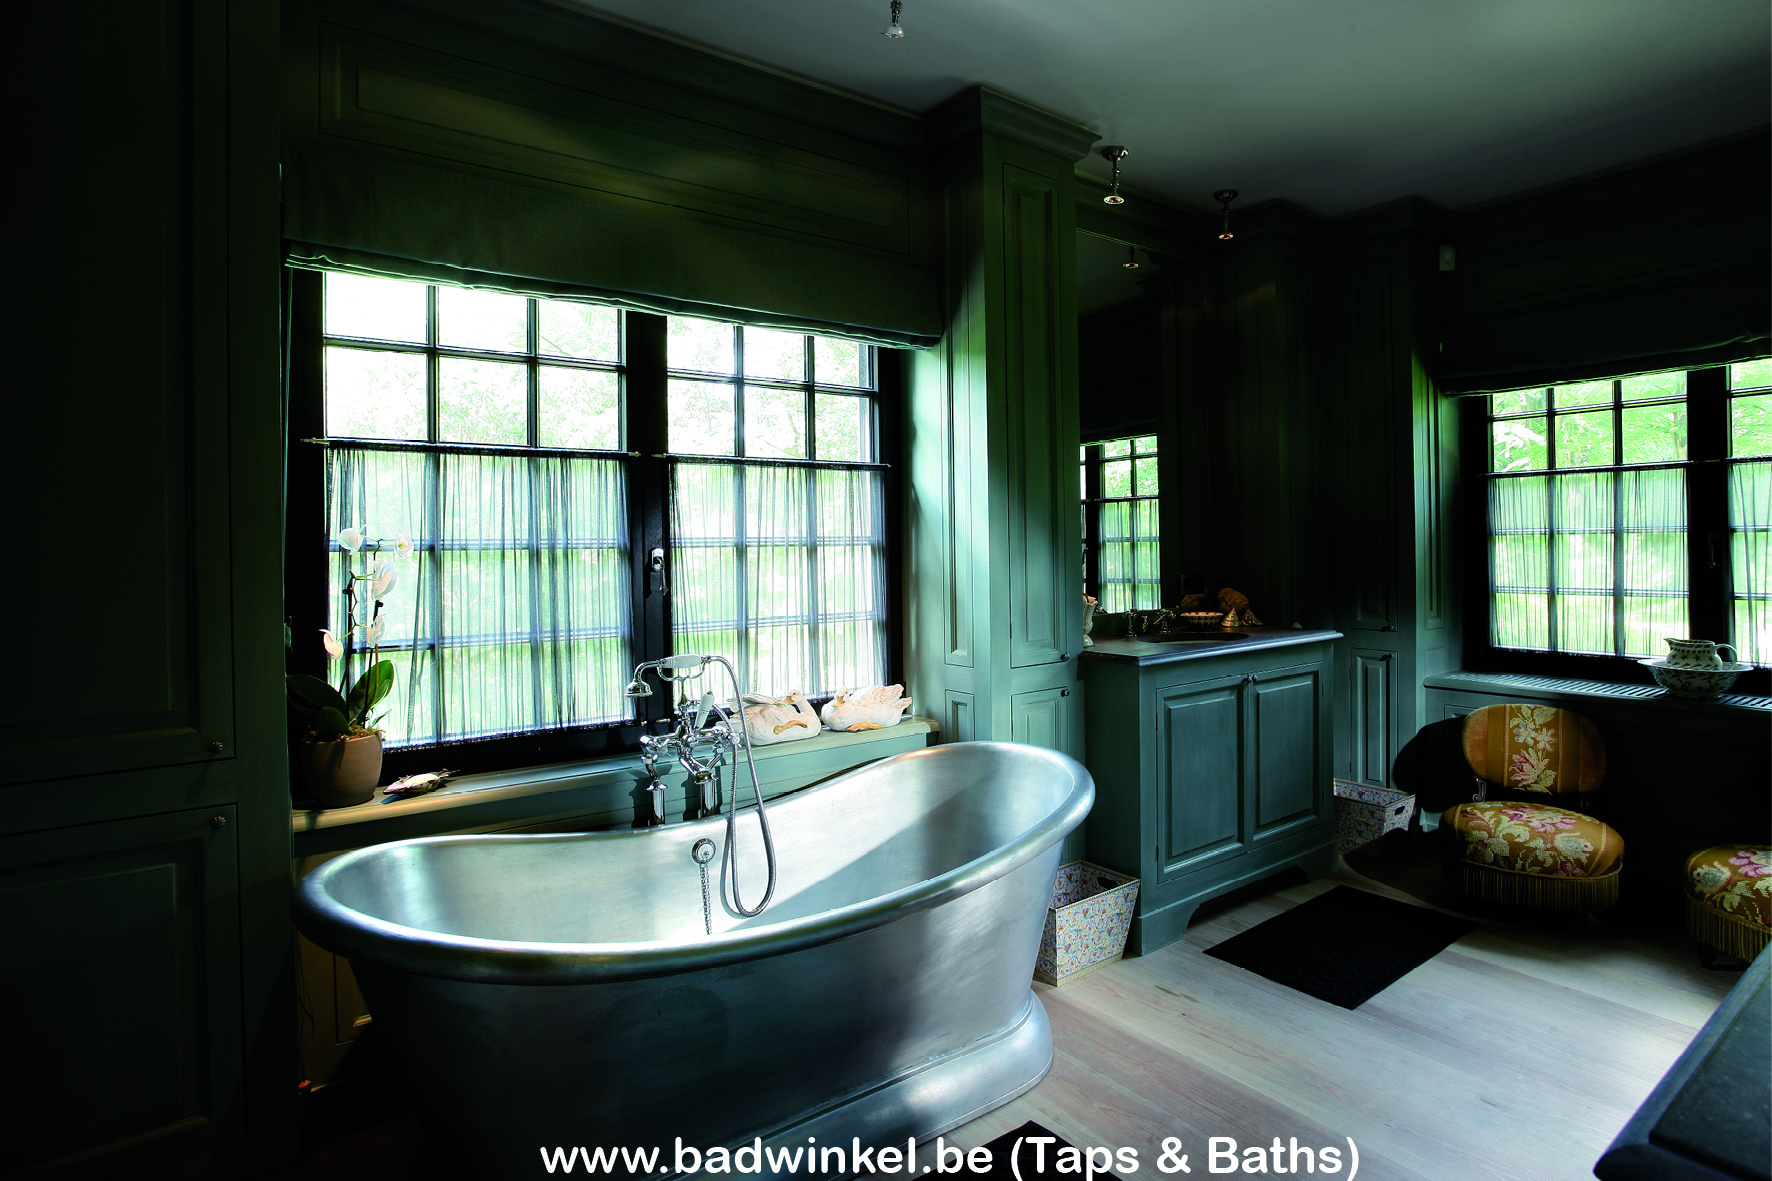 Taps & Baths